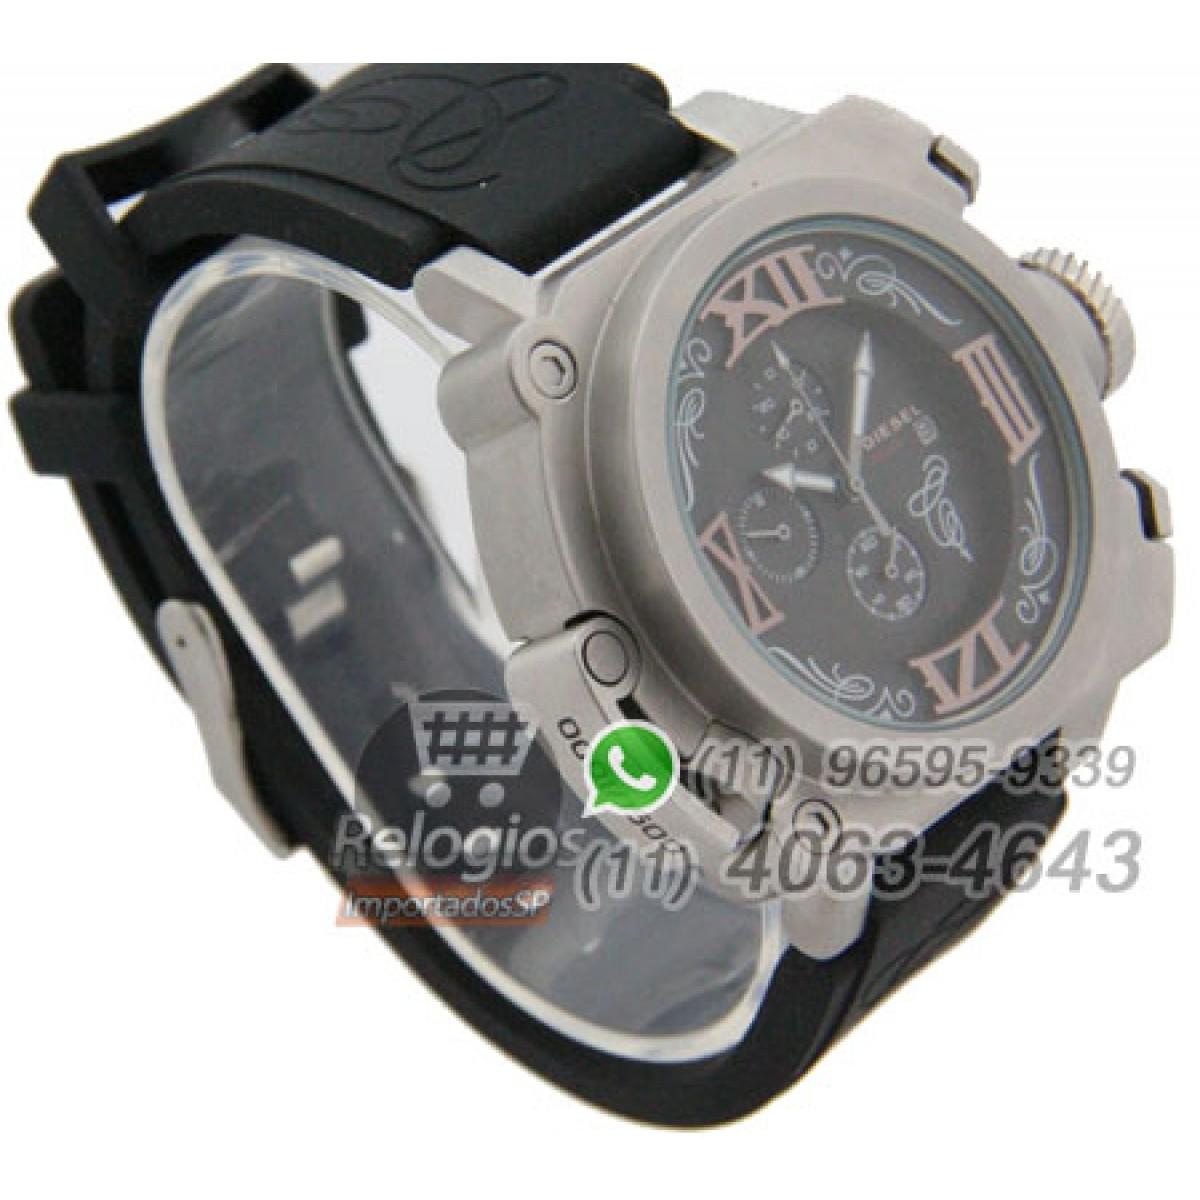 f9b0af14d6f Relógio Réplica Diesel Batman Prata Preto ( PROMOÇÃO )